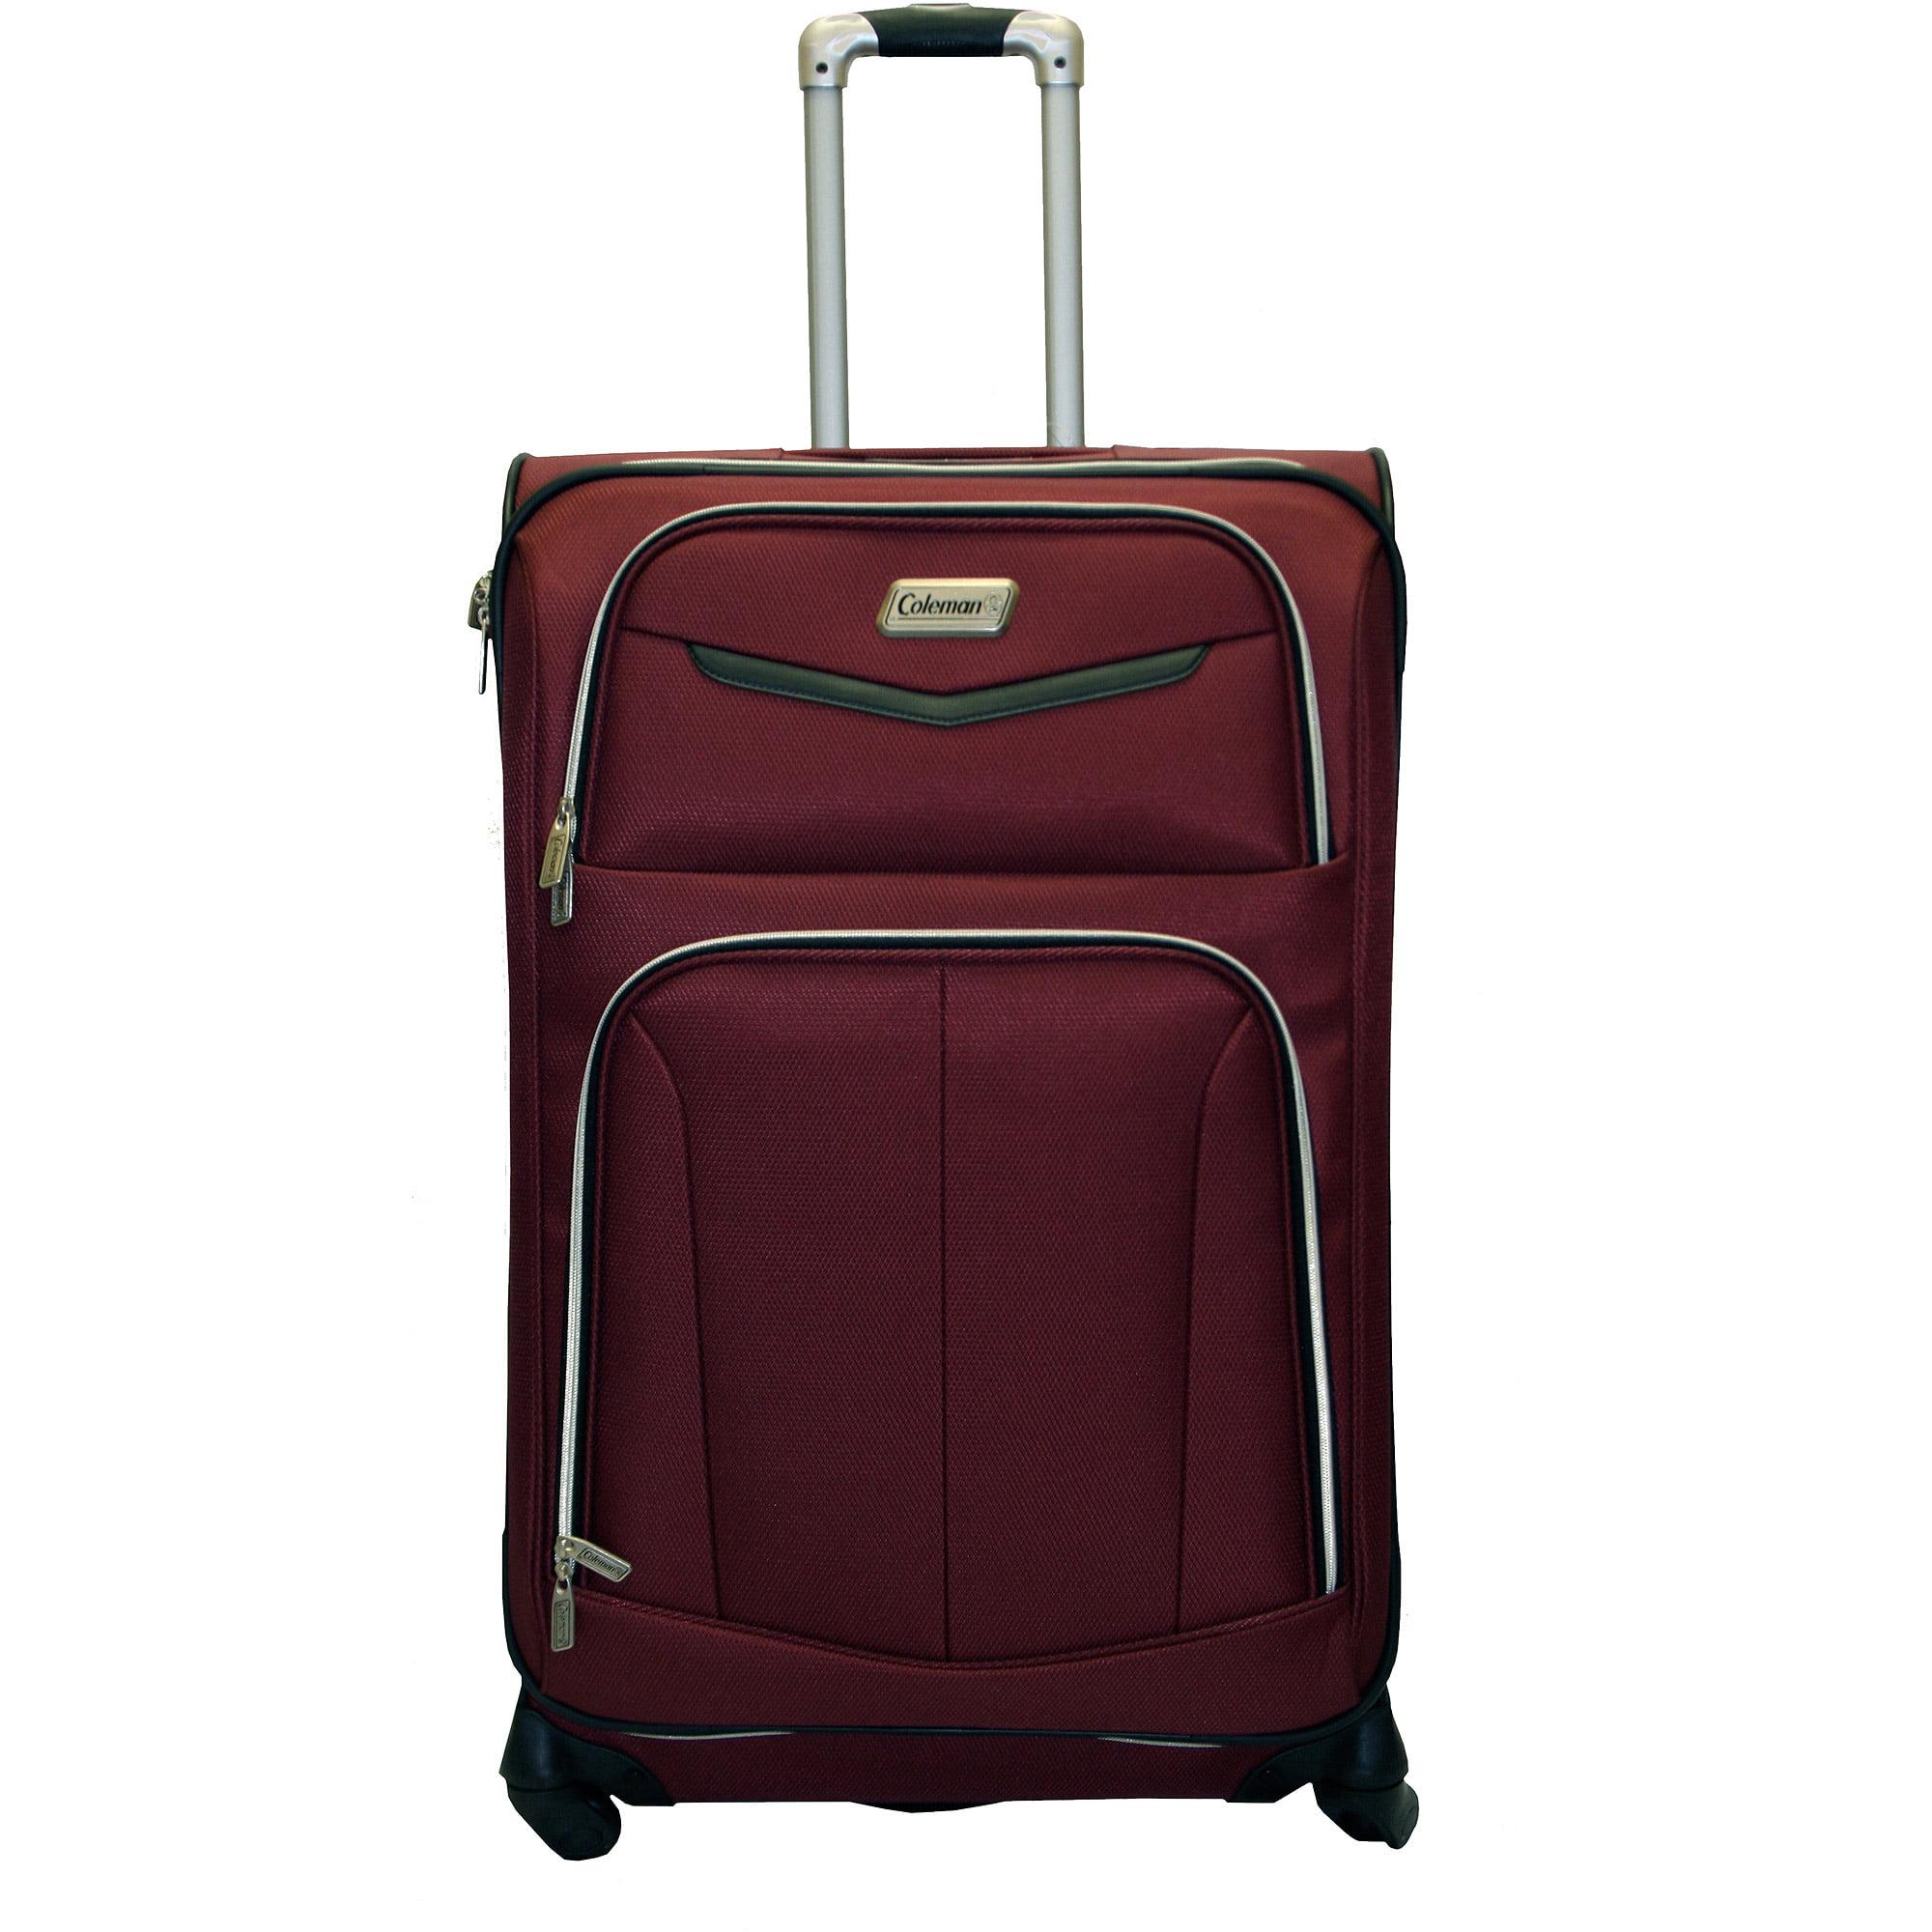 Coleman Gateway Upright Luggage - Walmart.com